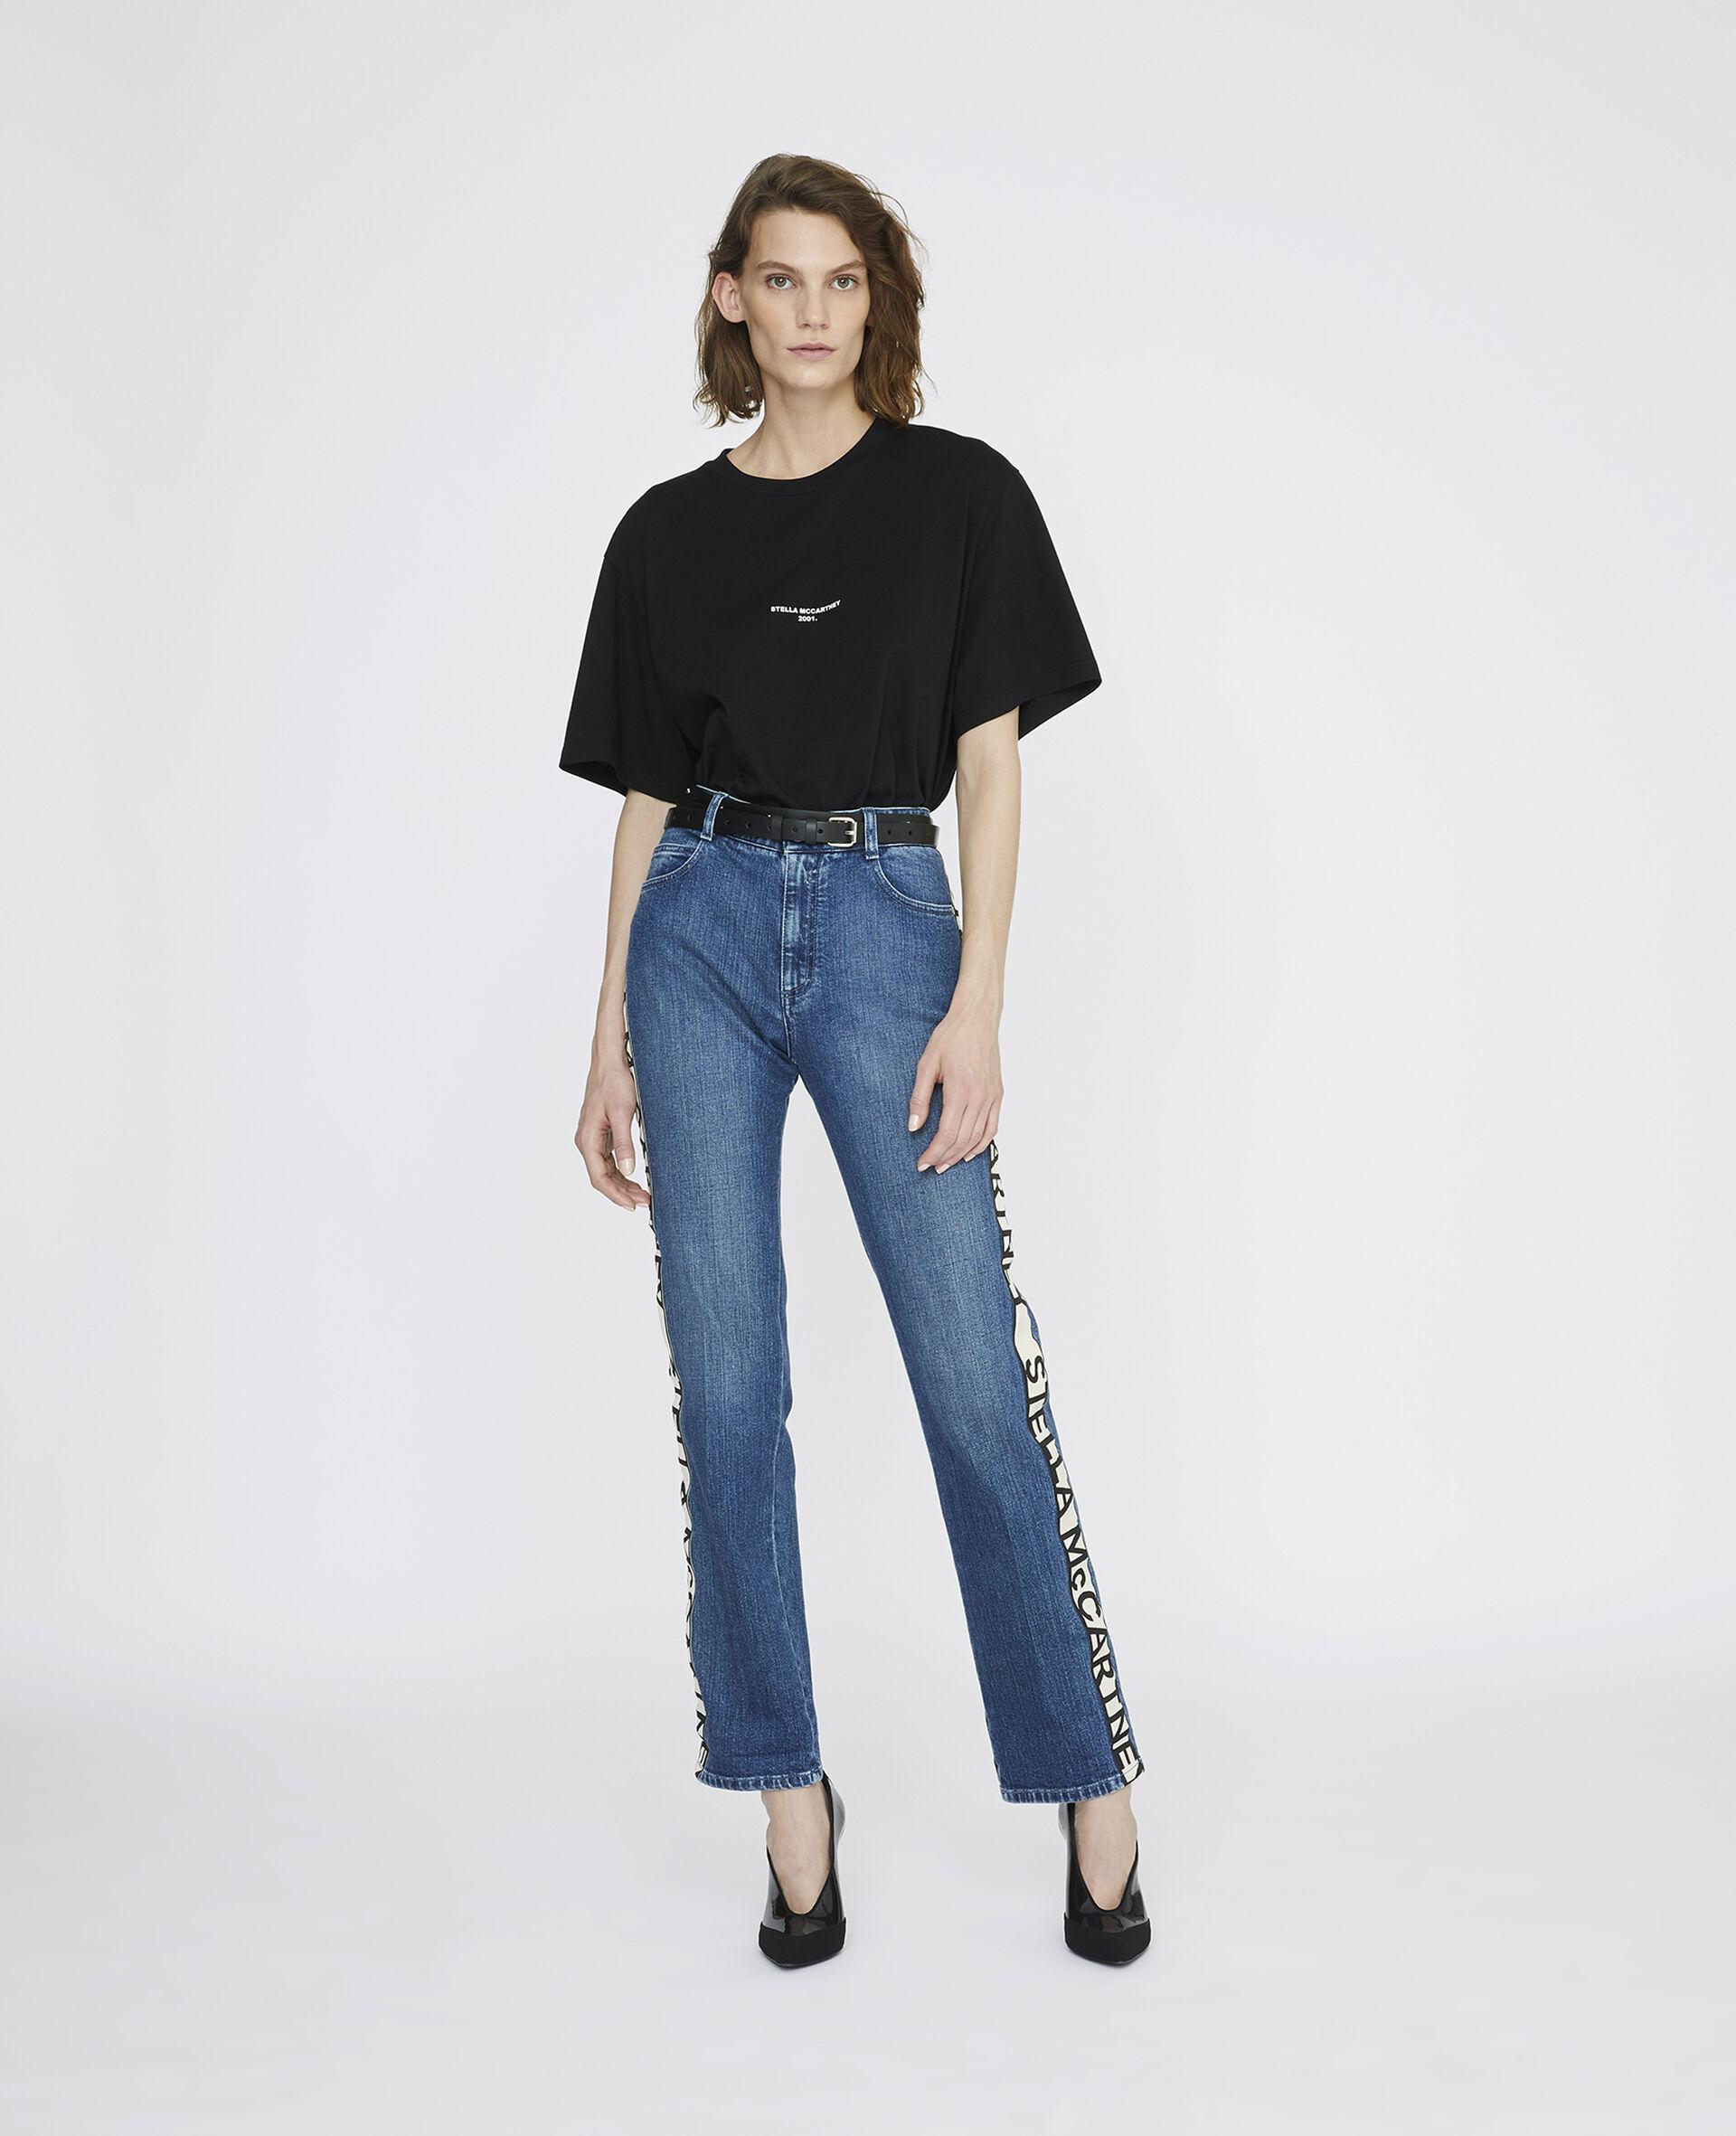 Stella McCartney 2001. T-Shirt-Schwarz-large image number 1